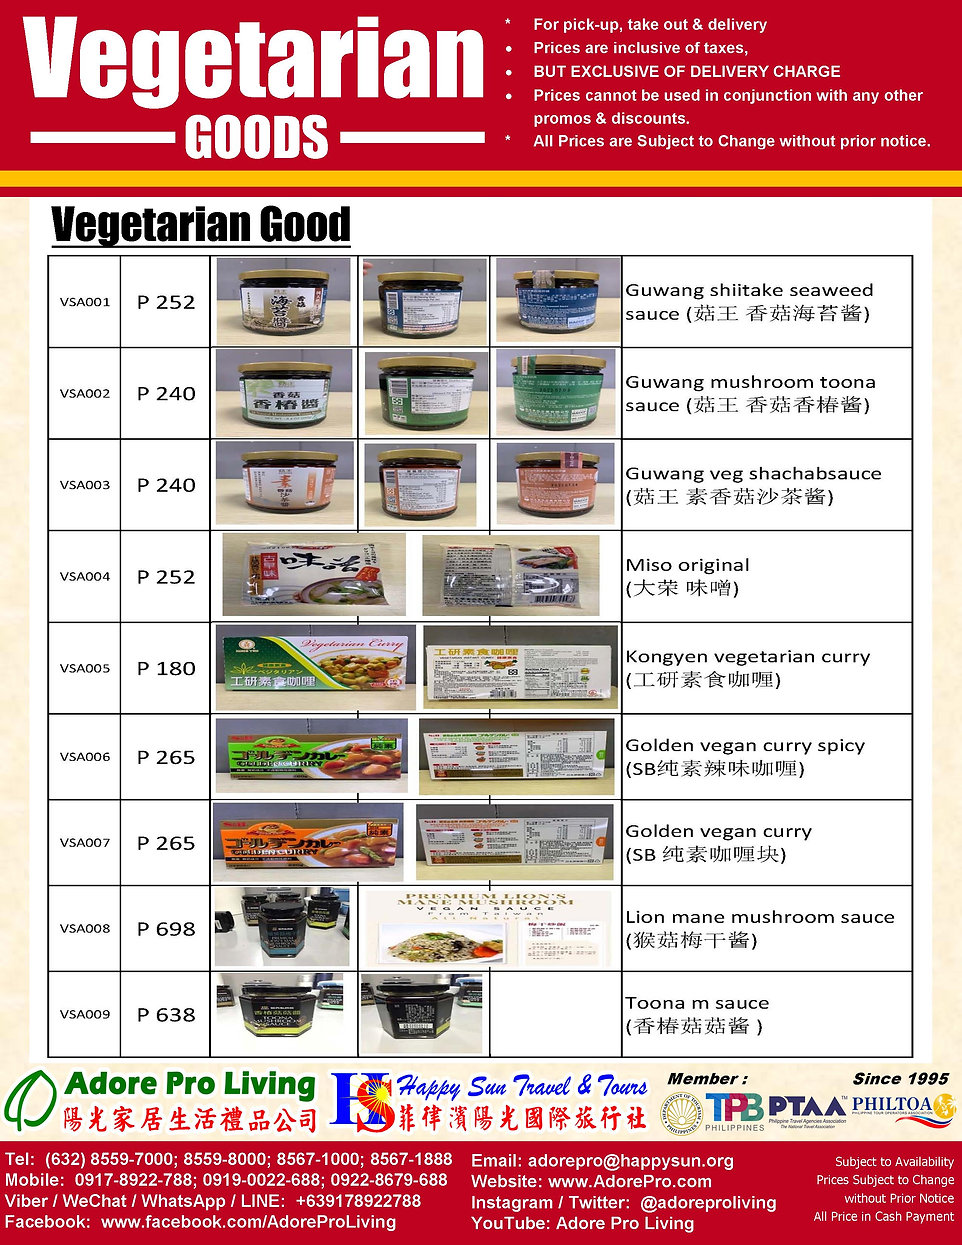 P1_Vegetarian Goods_20200929.jpg